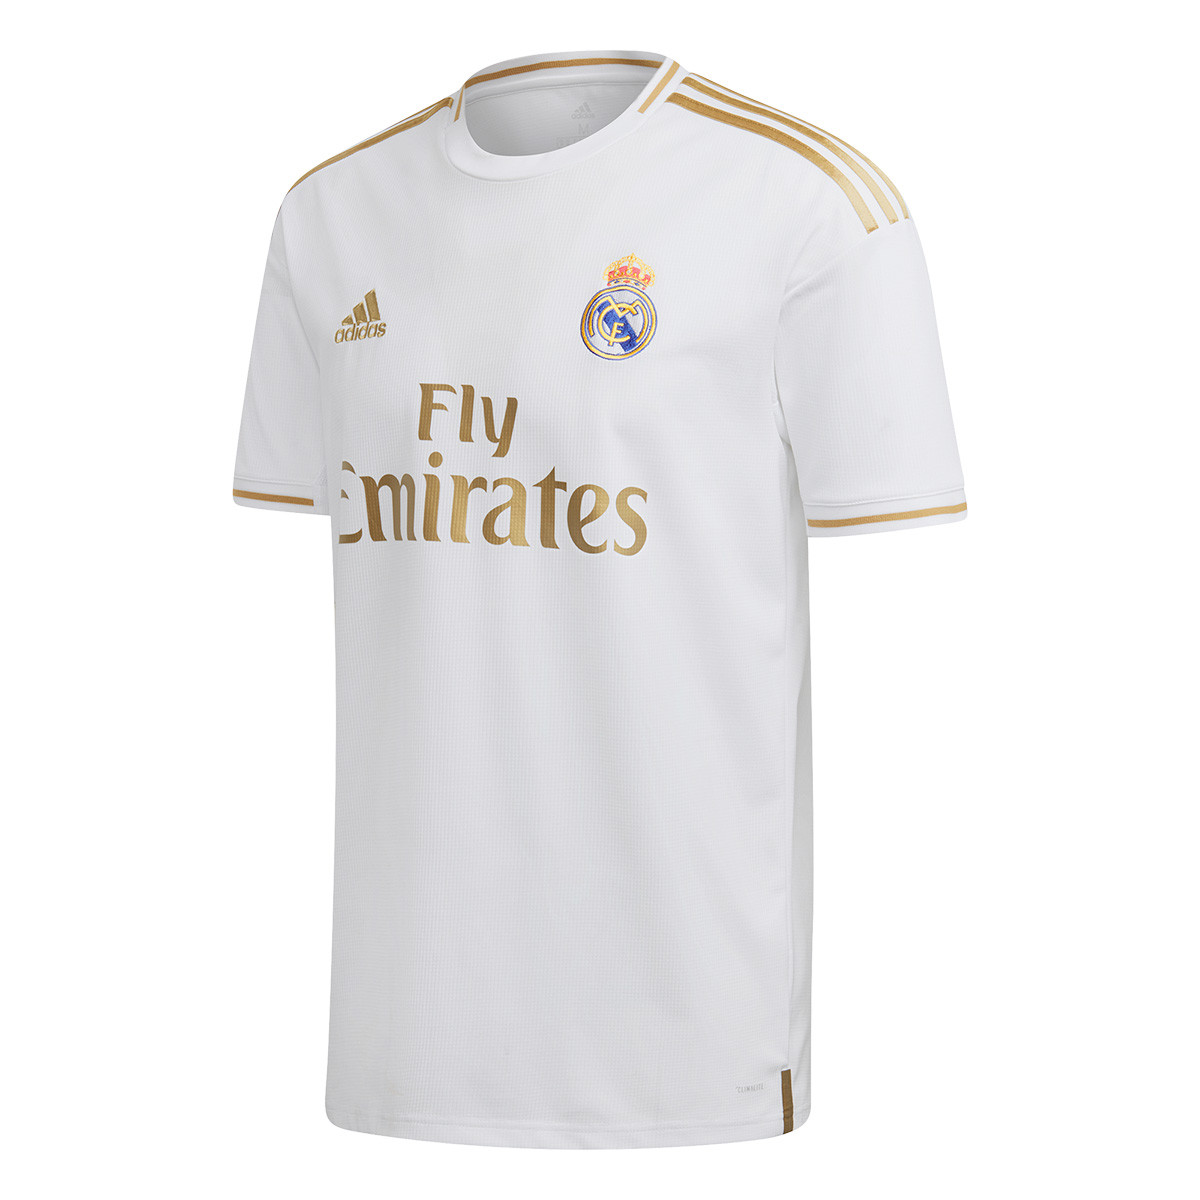 Camisola adidas Real Madrid Equipamento Oficial 2019 2020